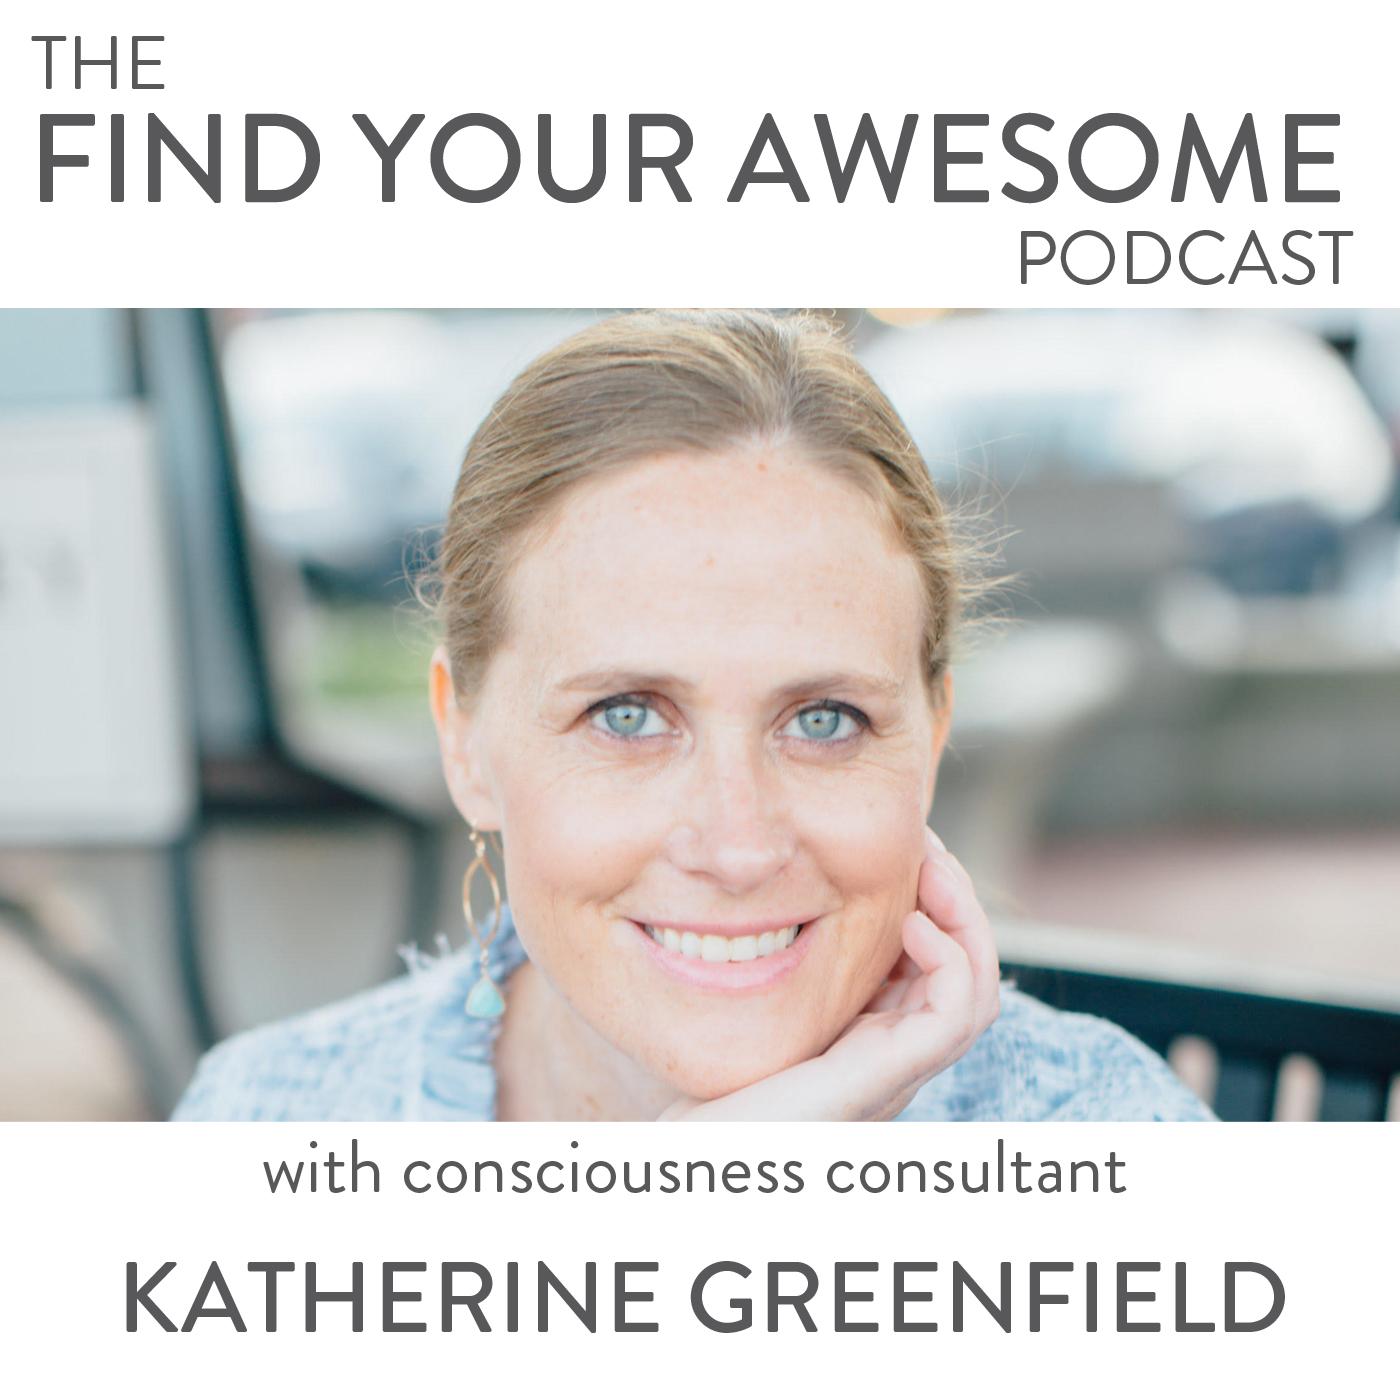 KatherineGreenfield_podcast_coverart.jpg